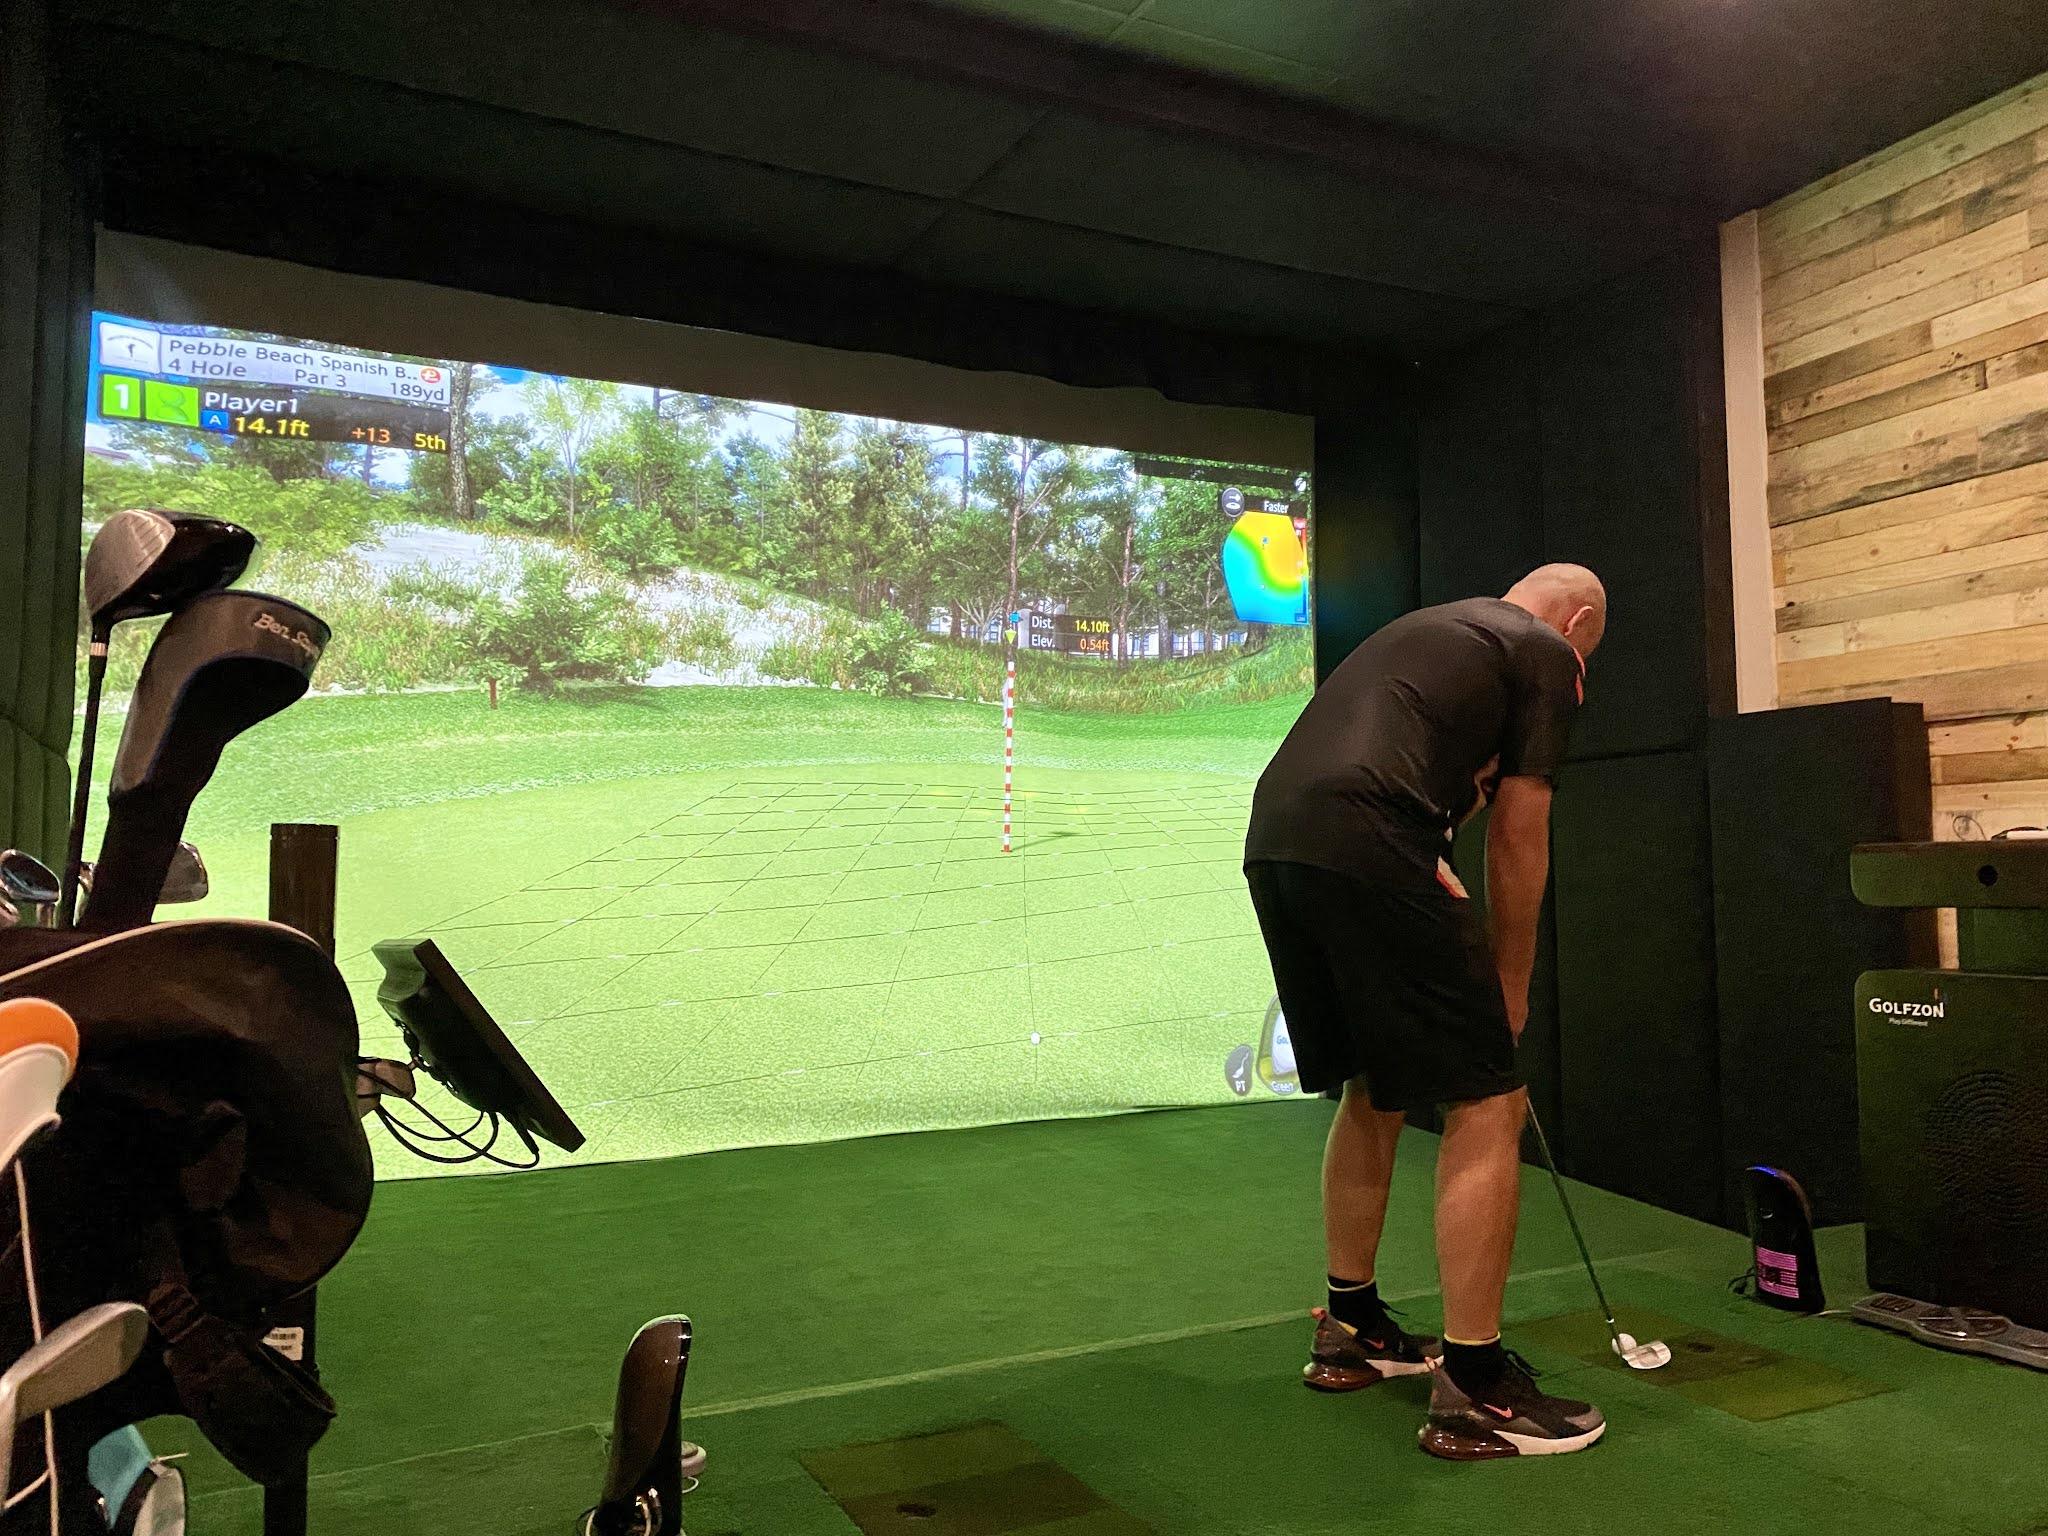 man playing on a golf simulator